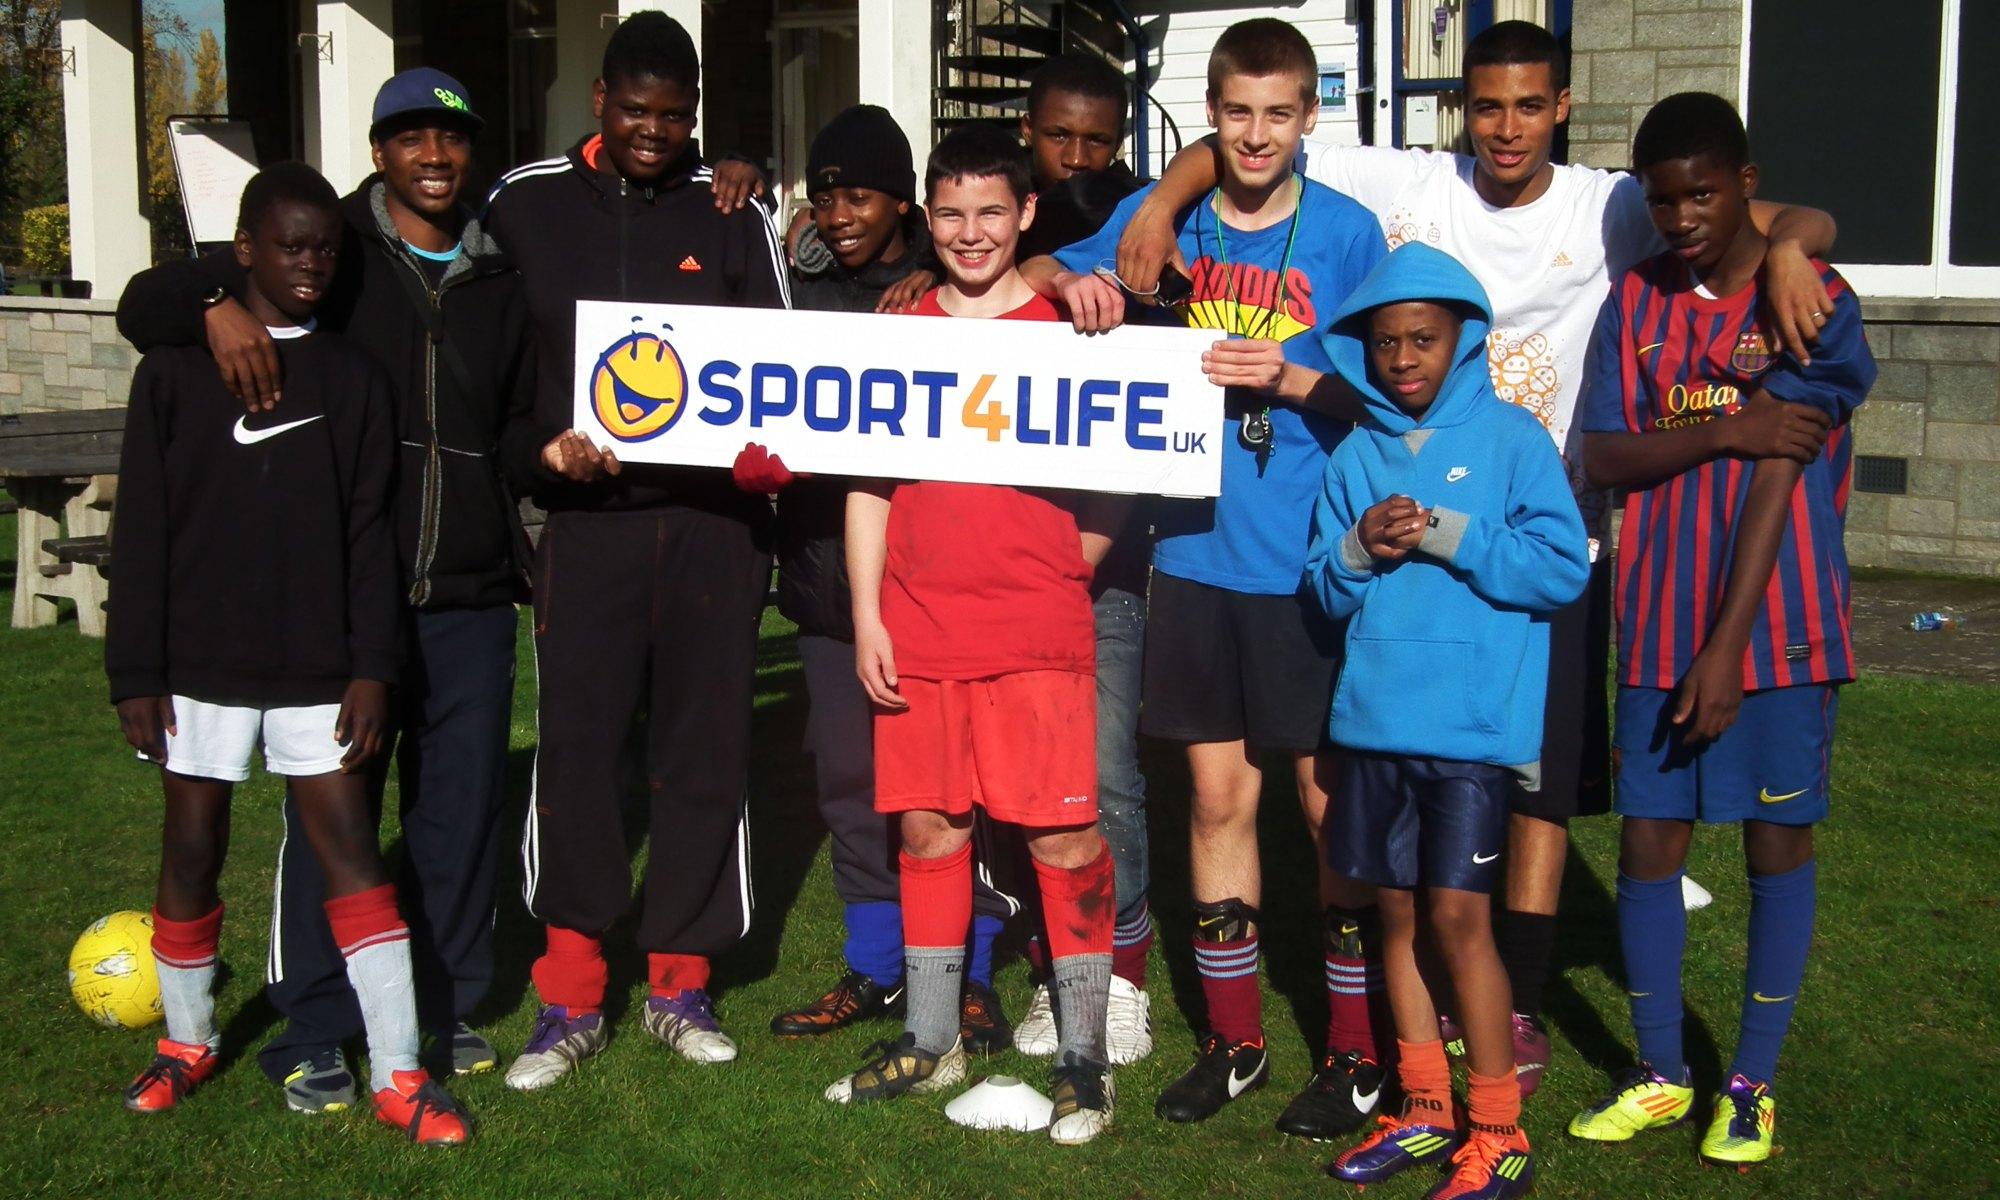 Sport 4 Life image